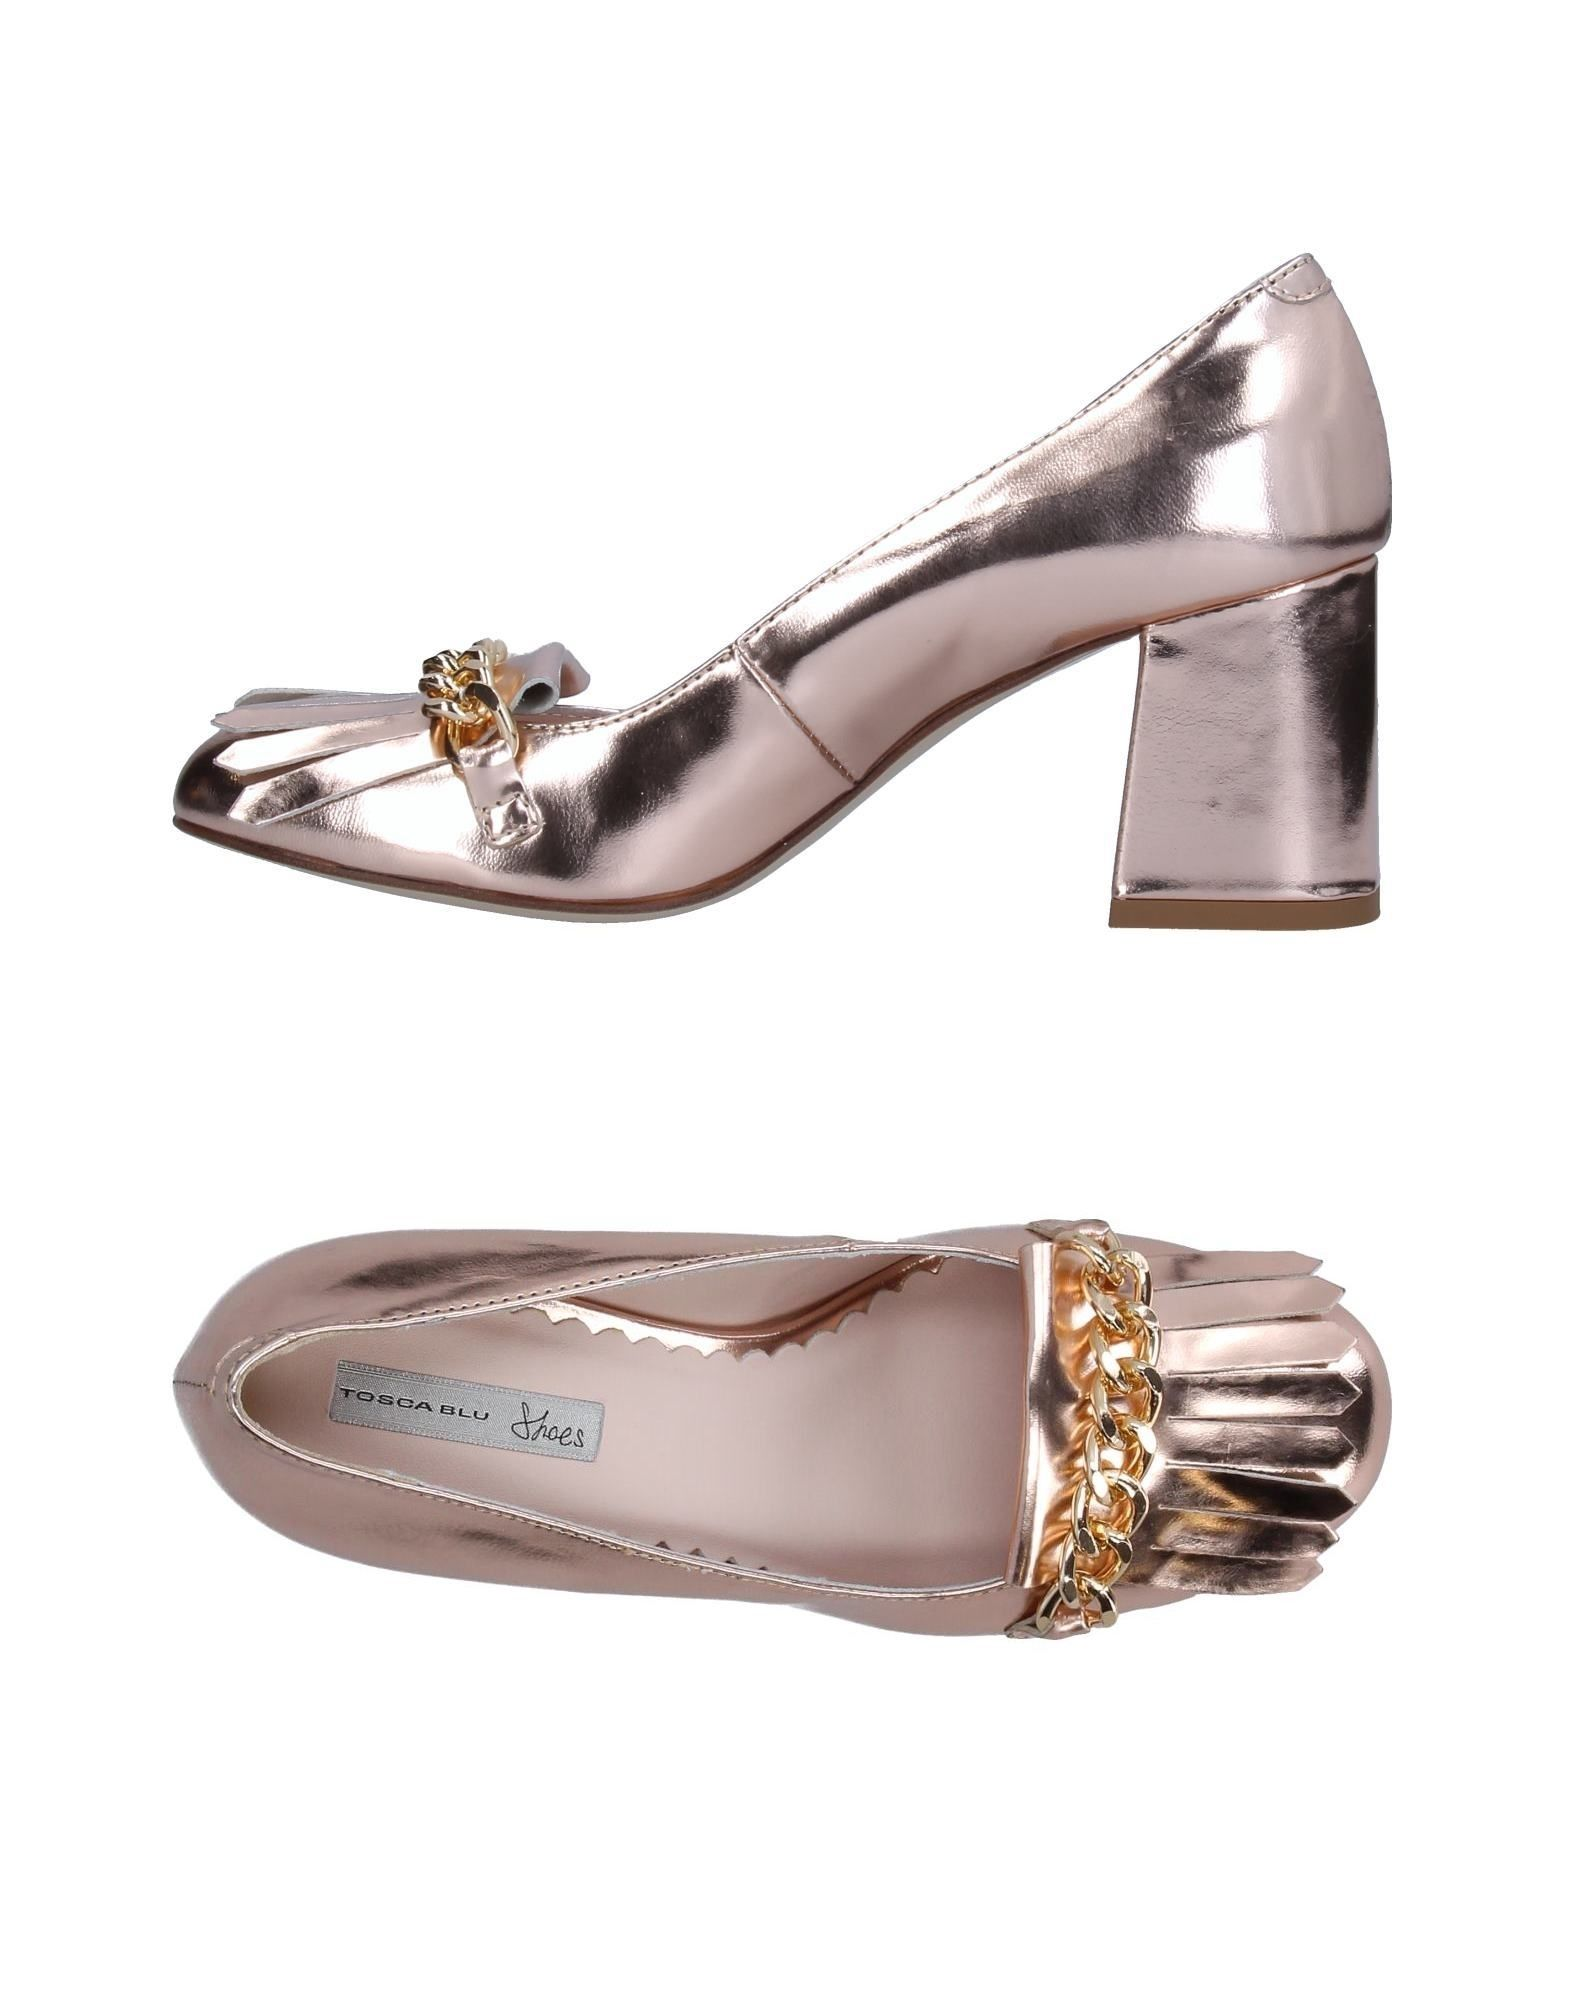 Tosca Blu Shoes Pumps Damen  Qualität 11326319KI Gute Qualität  beliebte Schuhe aed0bb